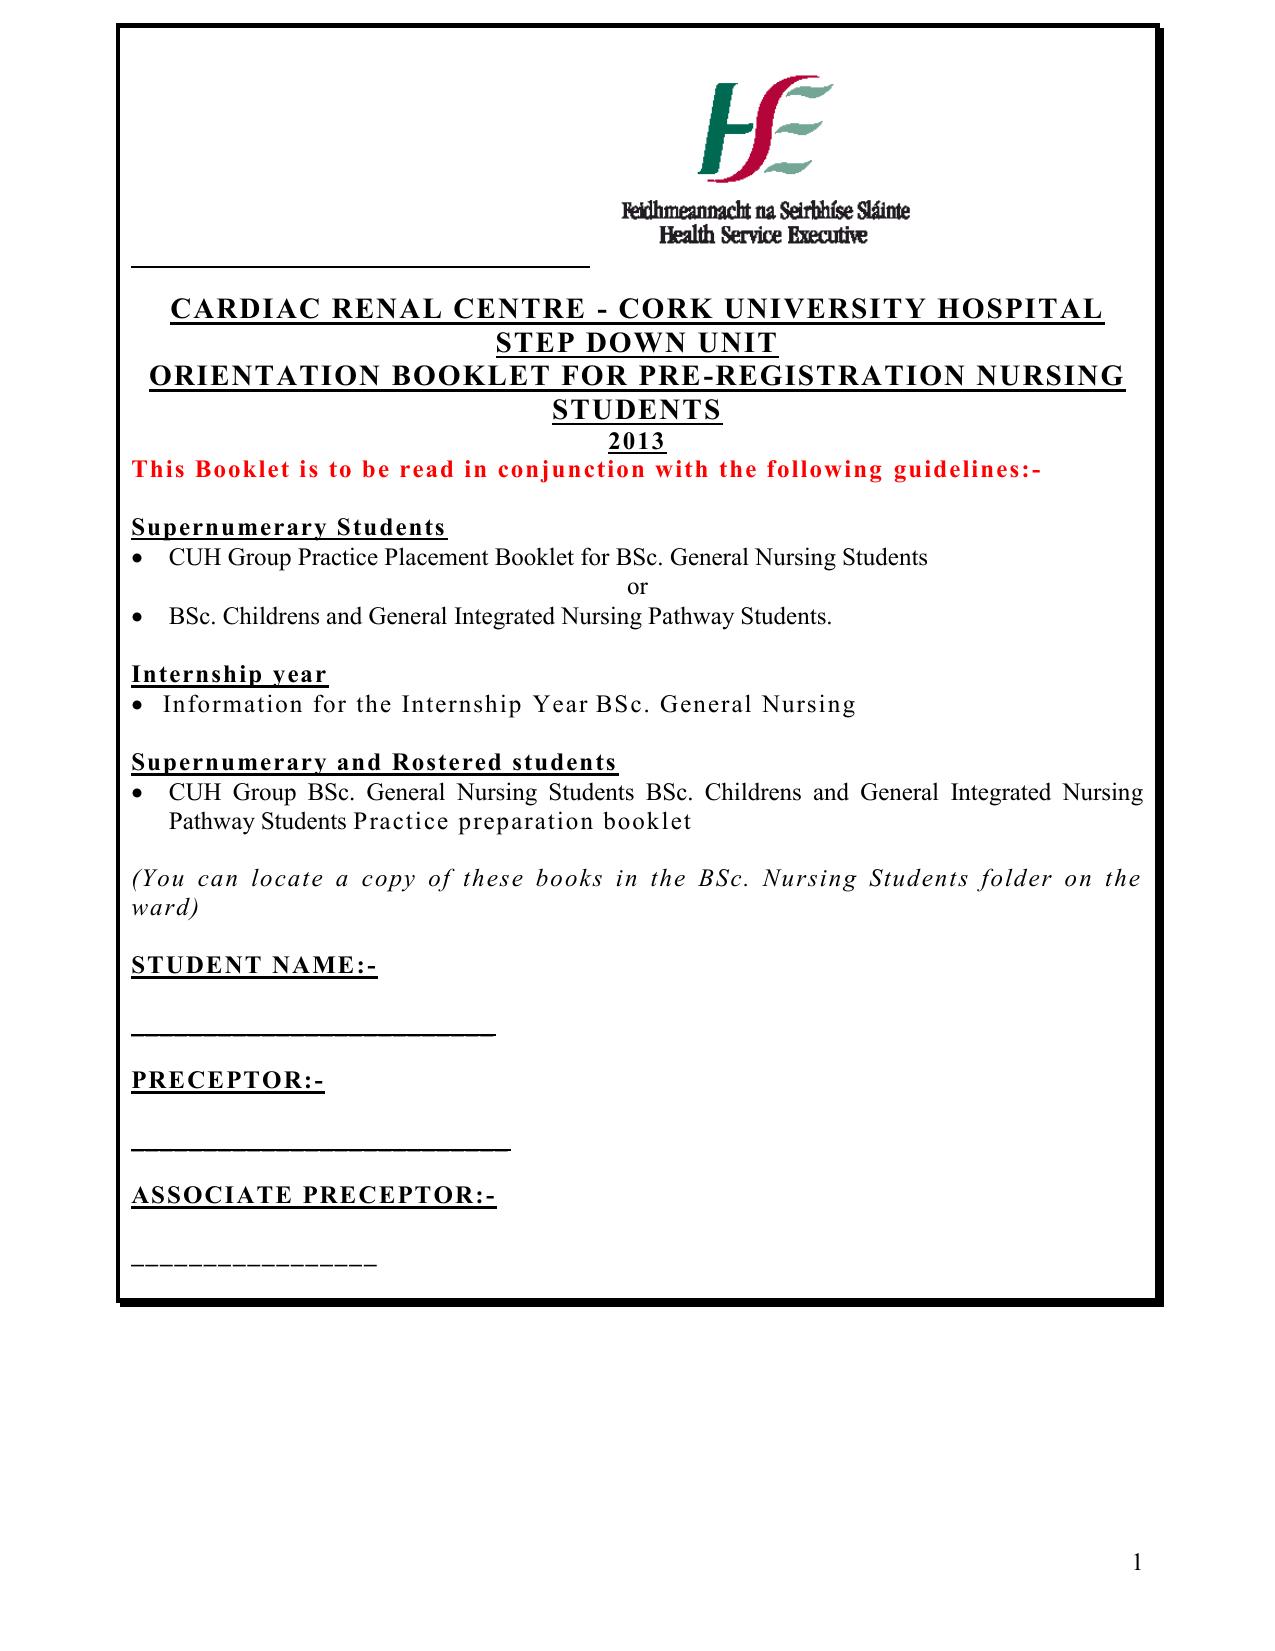 cardiac renal centre - cork university hospital step down unit